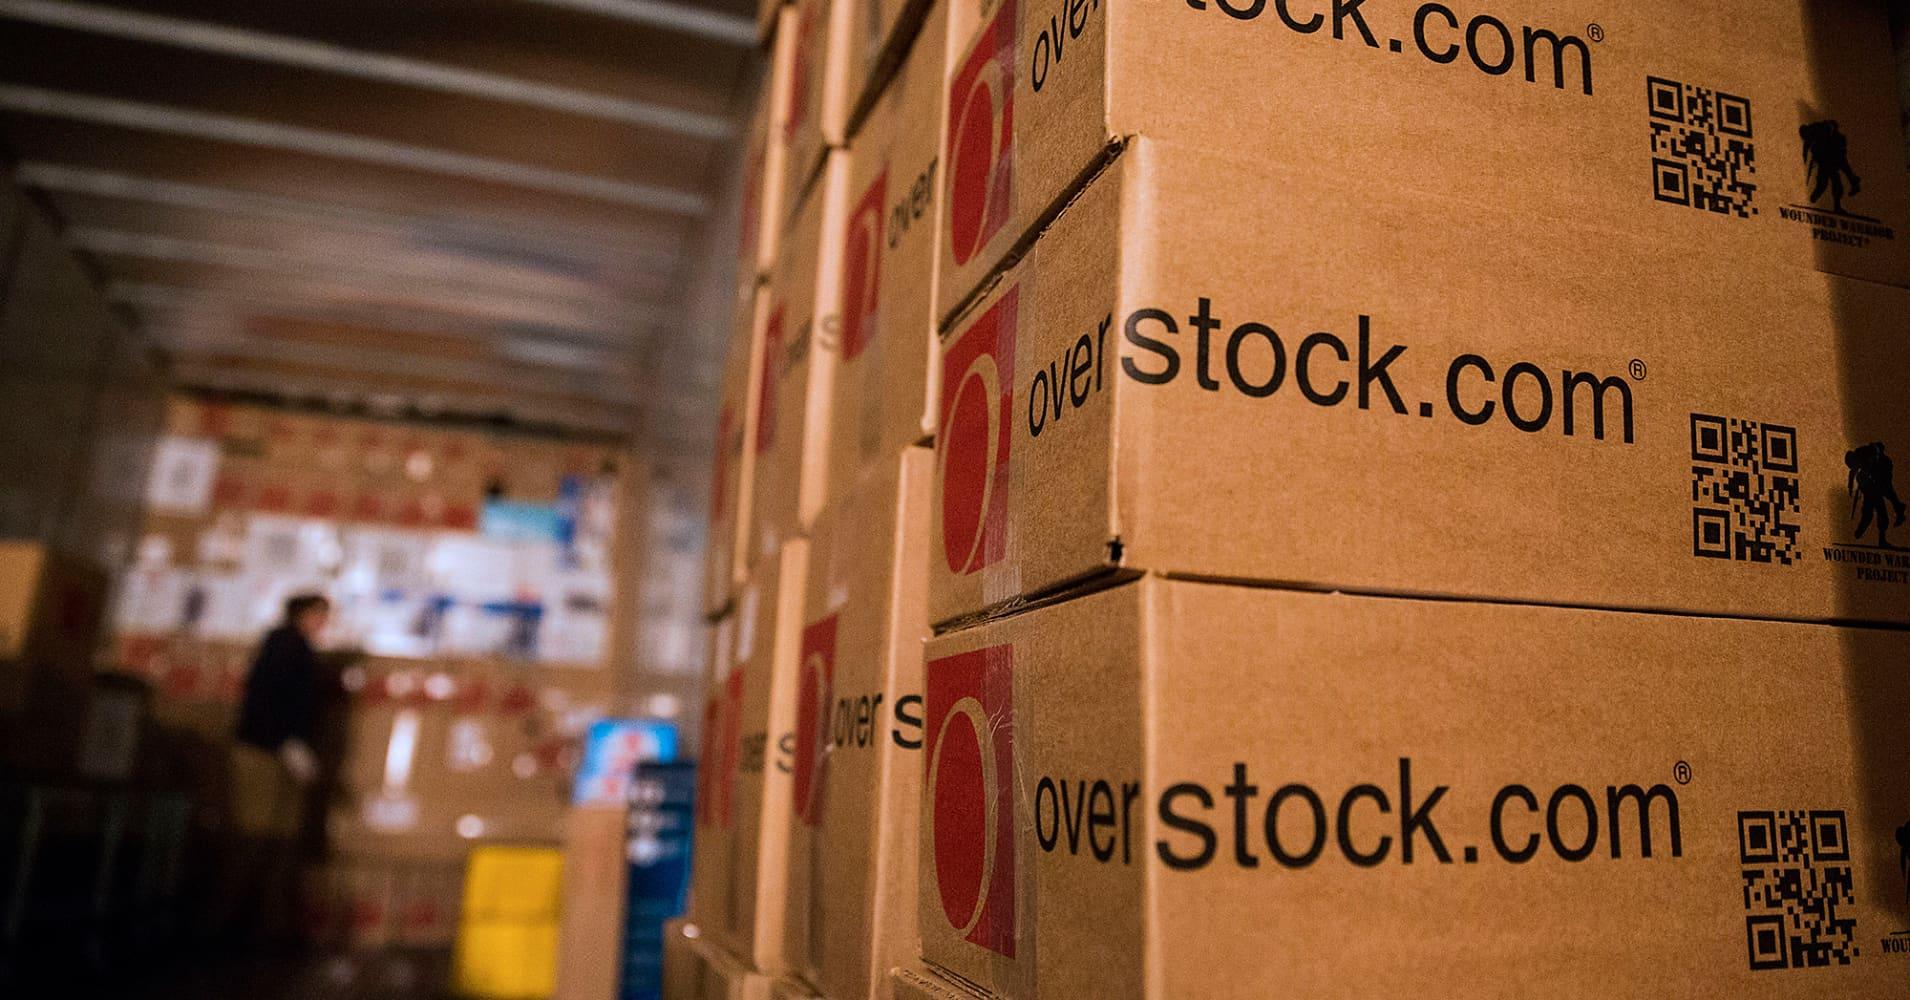 Overstock.com shares spike after blockchain unit announces for-profit property registry